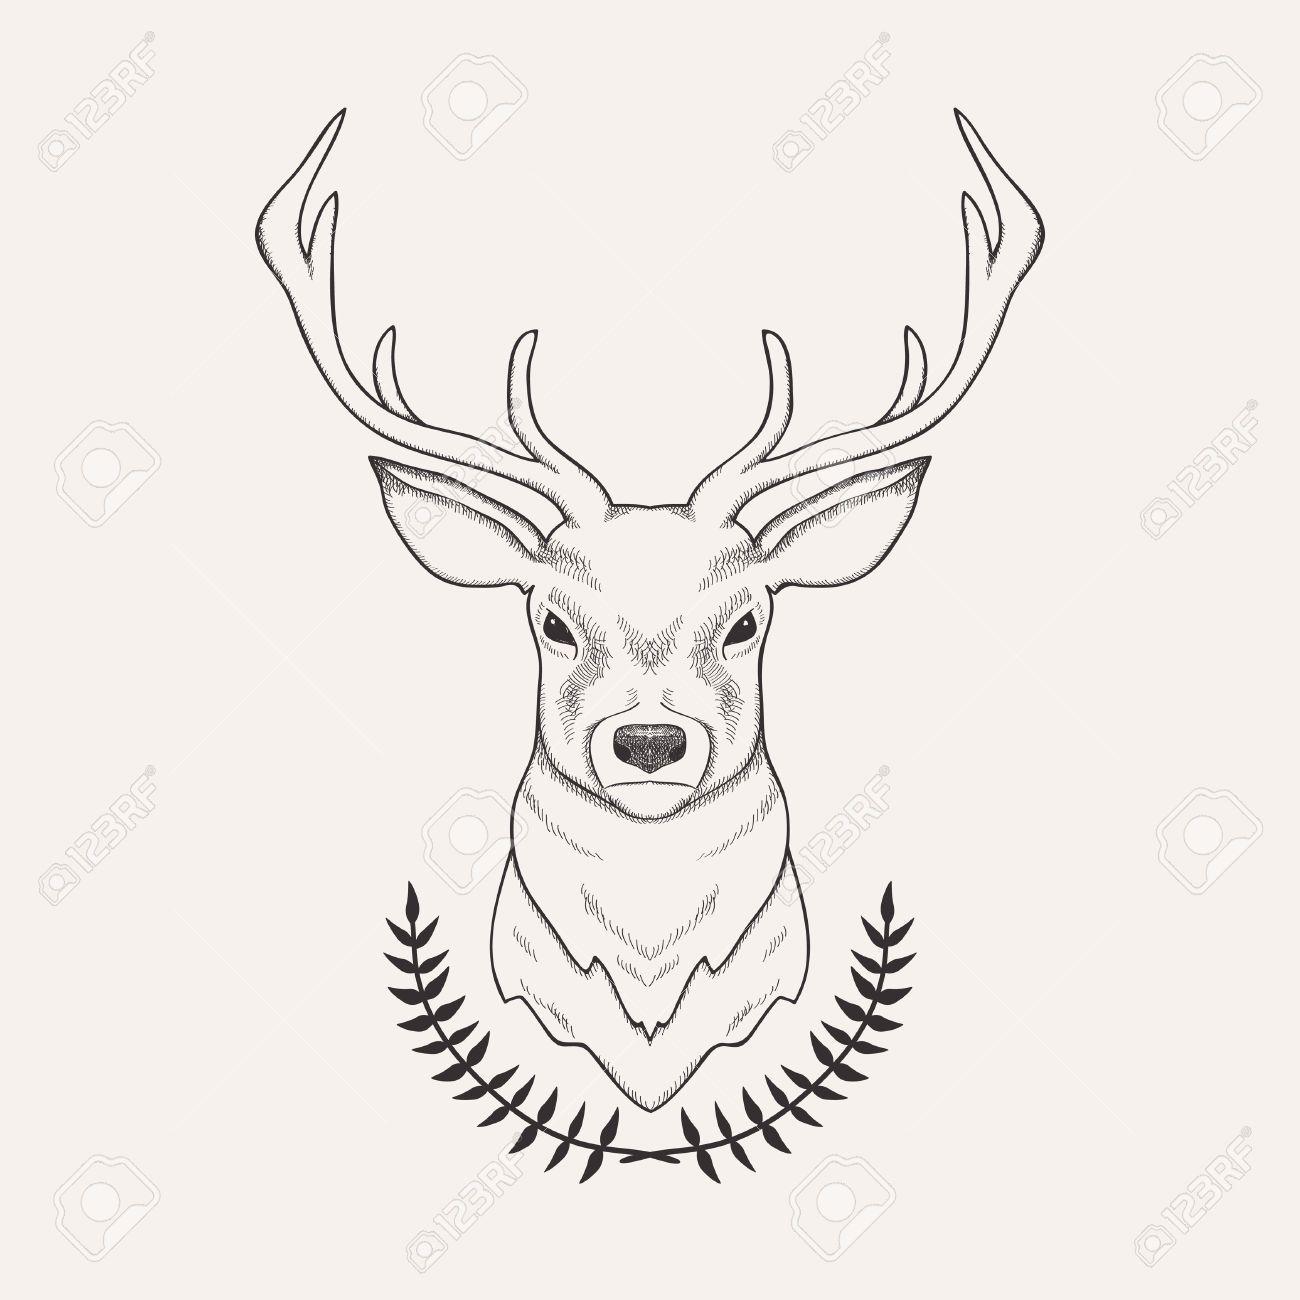 1300x1300 Vector Hand Drawn Illustration Of Deer And Laurel Tattoo Ideas